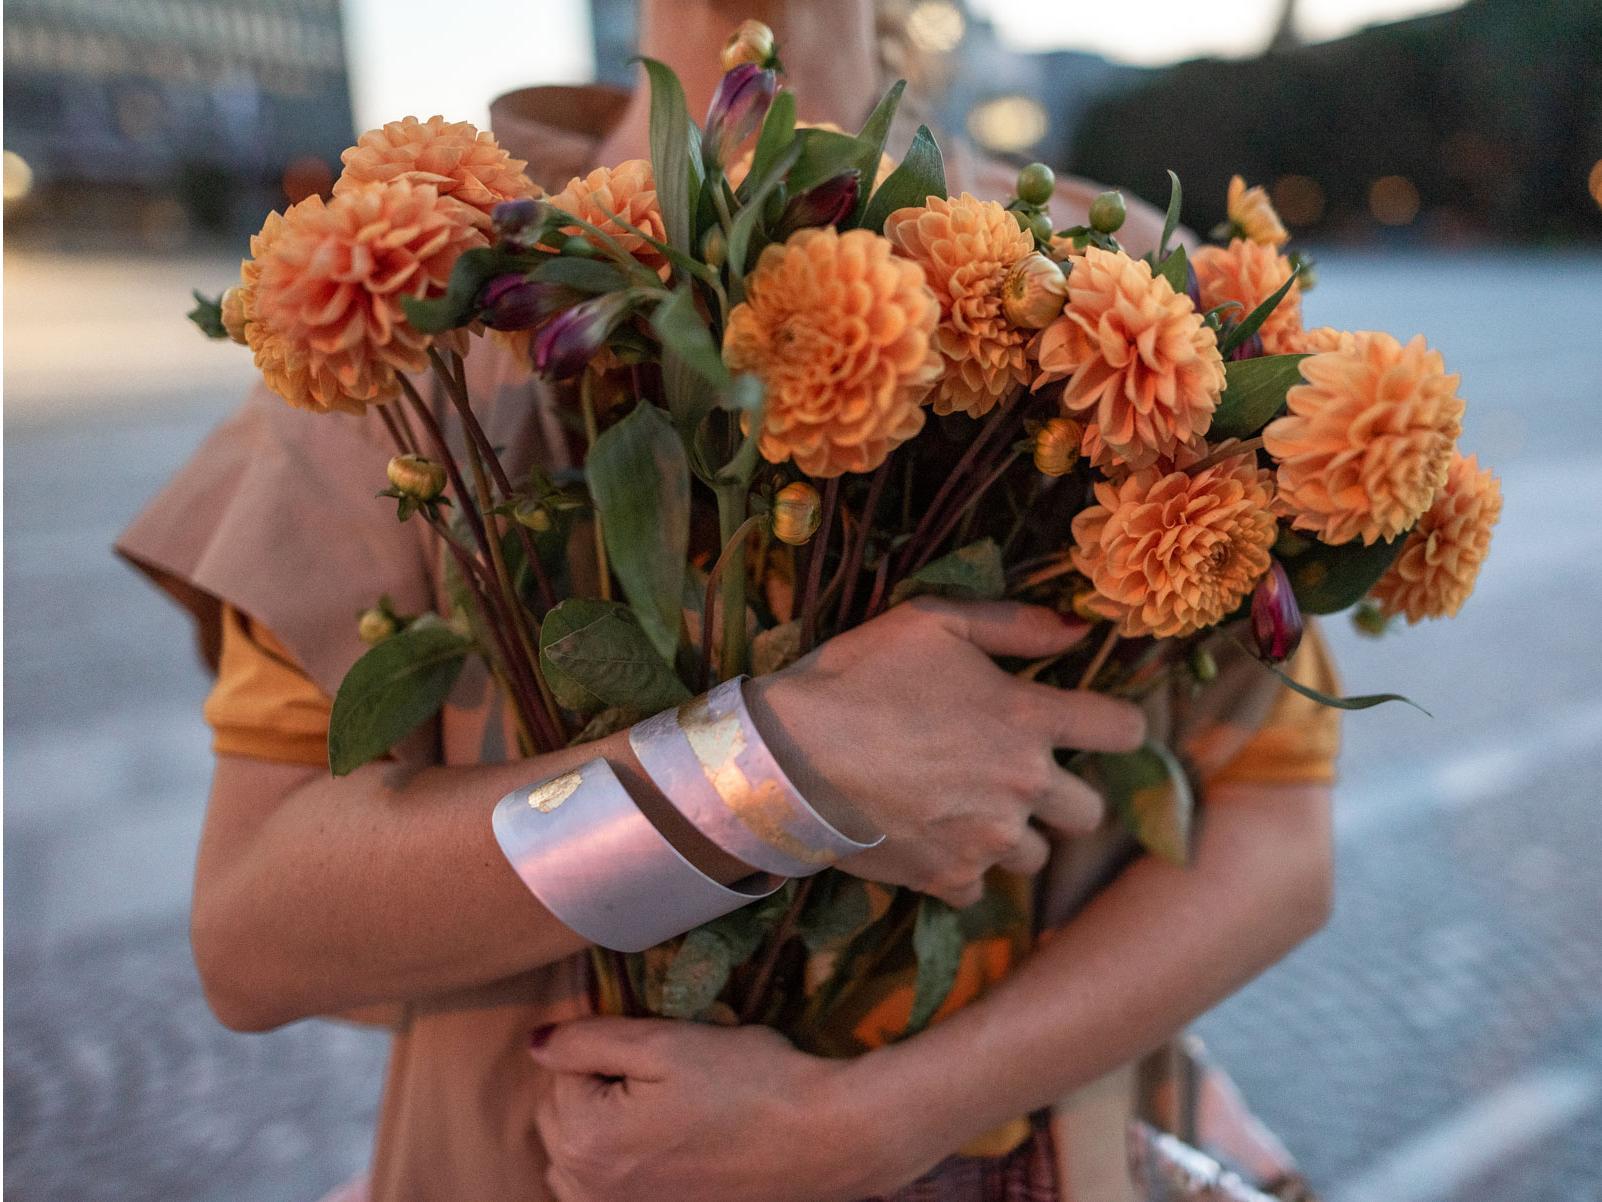 cvetlicno druzenje gardenia hummel zoofa beautyfullblog